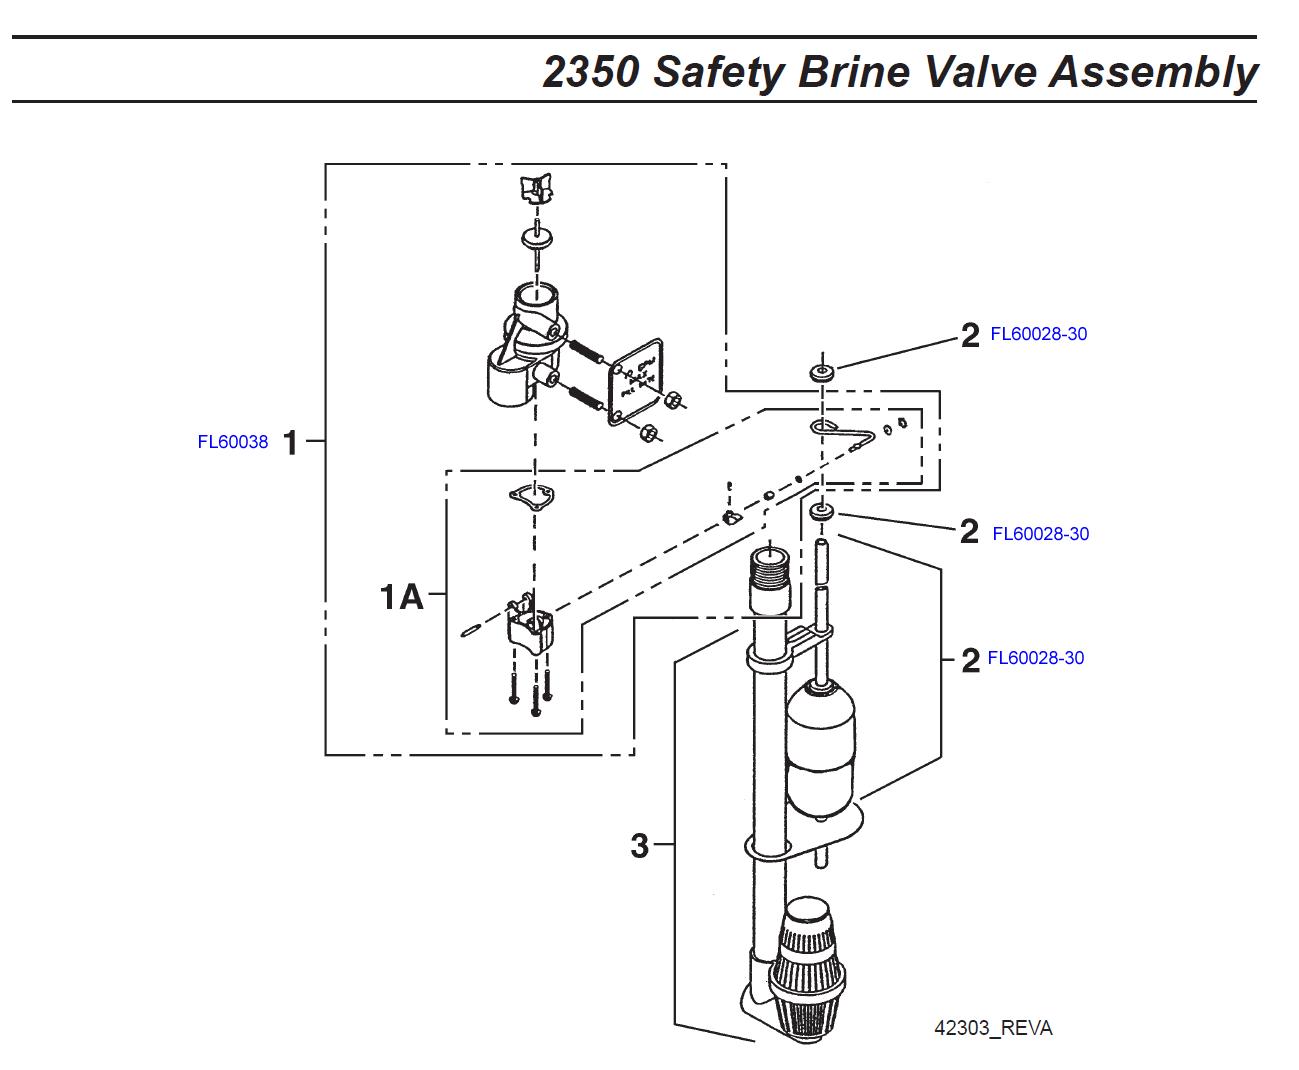 culligan water softener parts diagram 73 dodge dart wiring